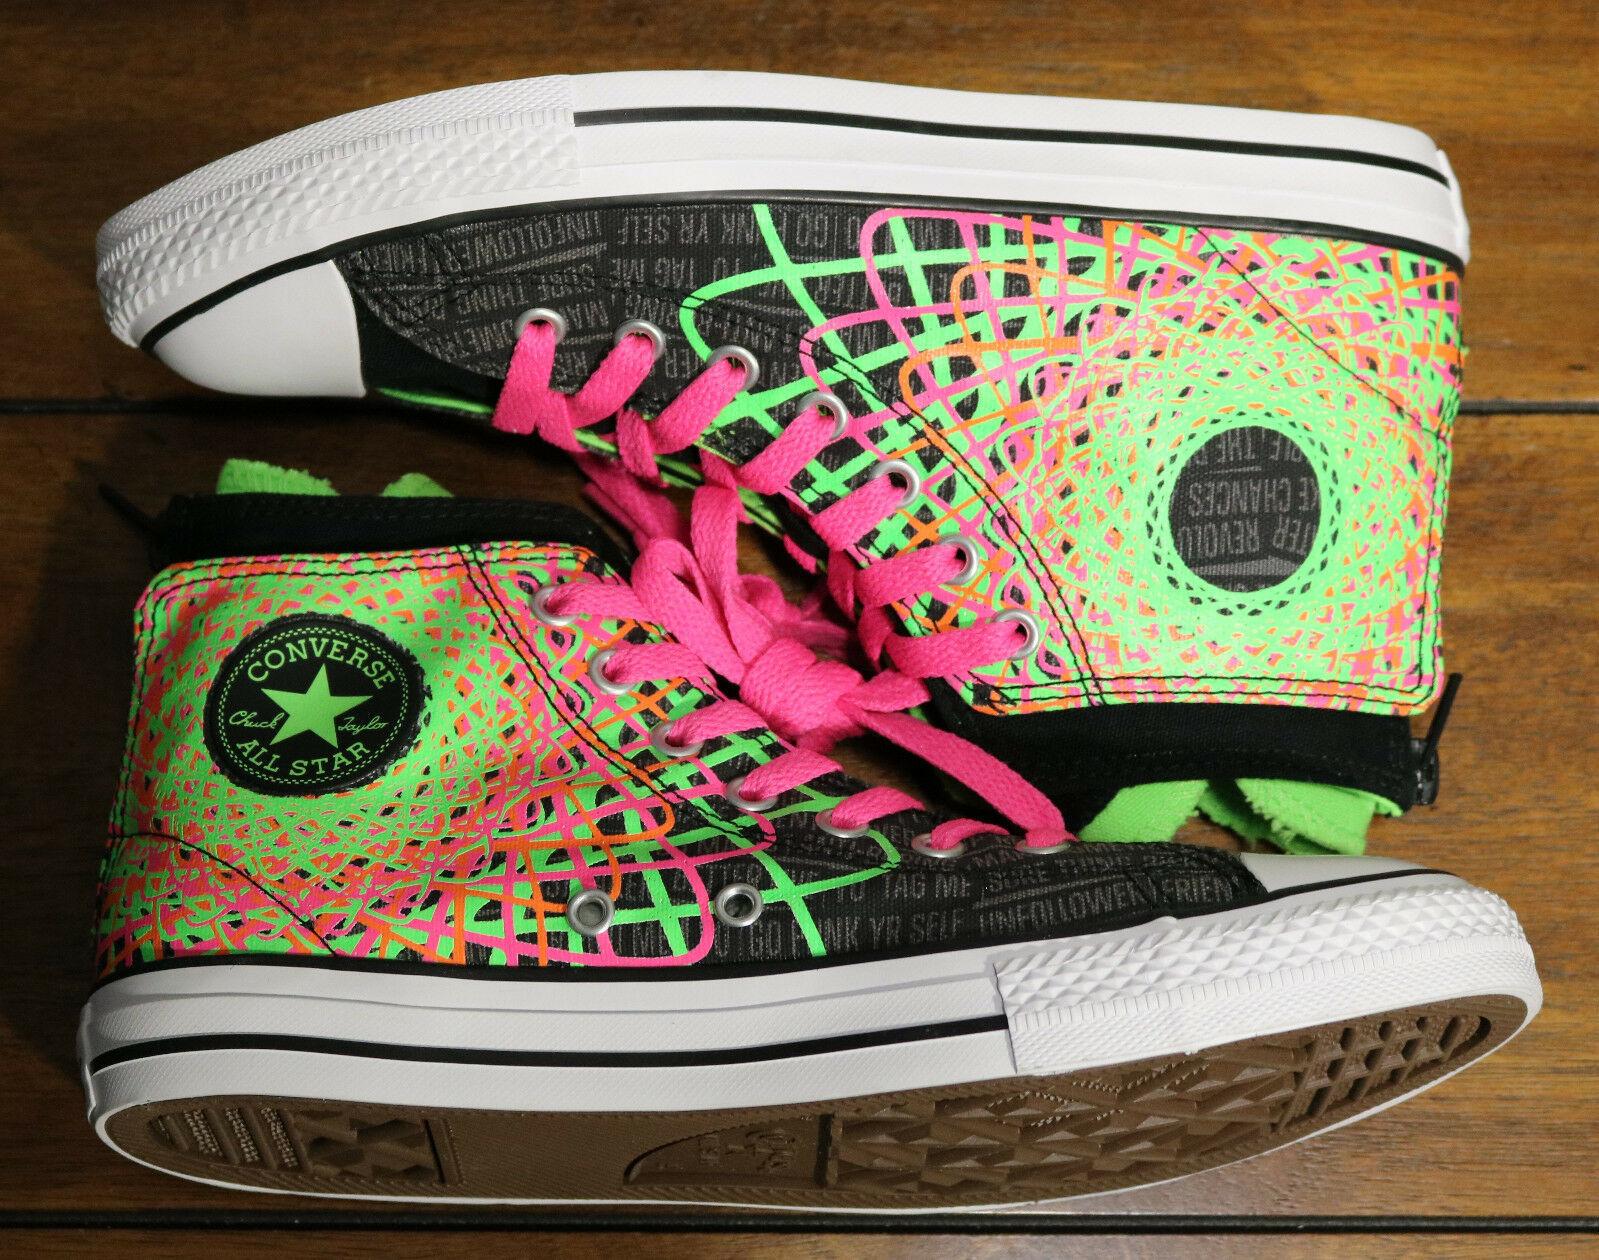 Converse Chuck Taylor All Star Zipback 649963C Black Pink Green Shoes Girls Sz 5 image 7